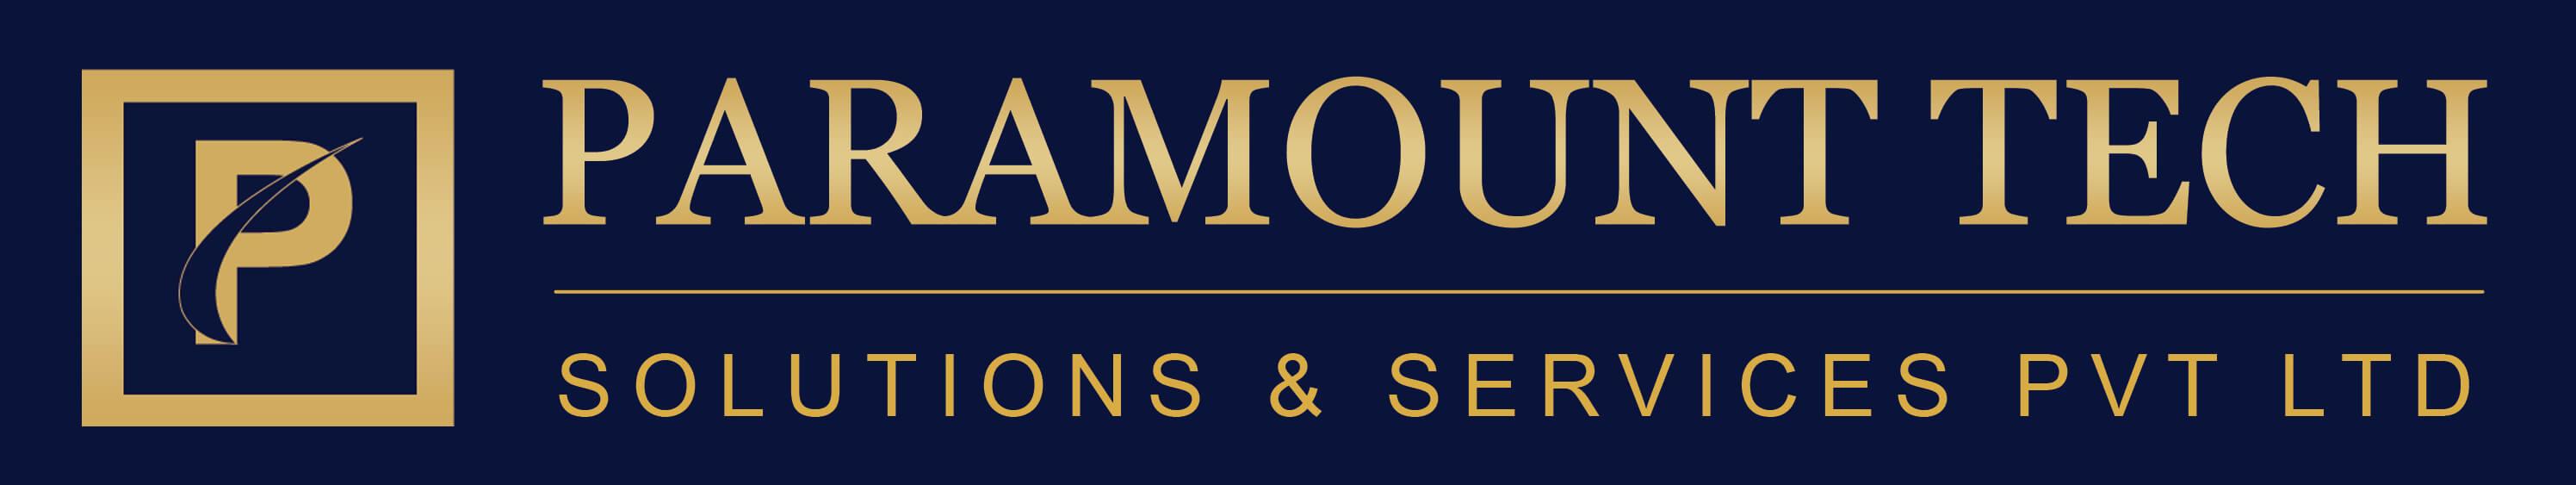 Paramount Tech Solutions and Services Pvt Ltd - Web Development company logo